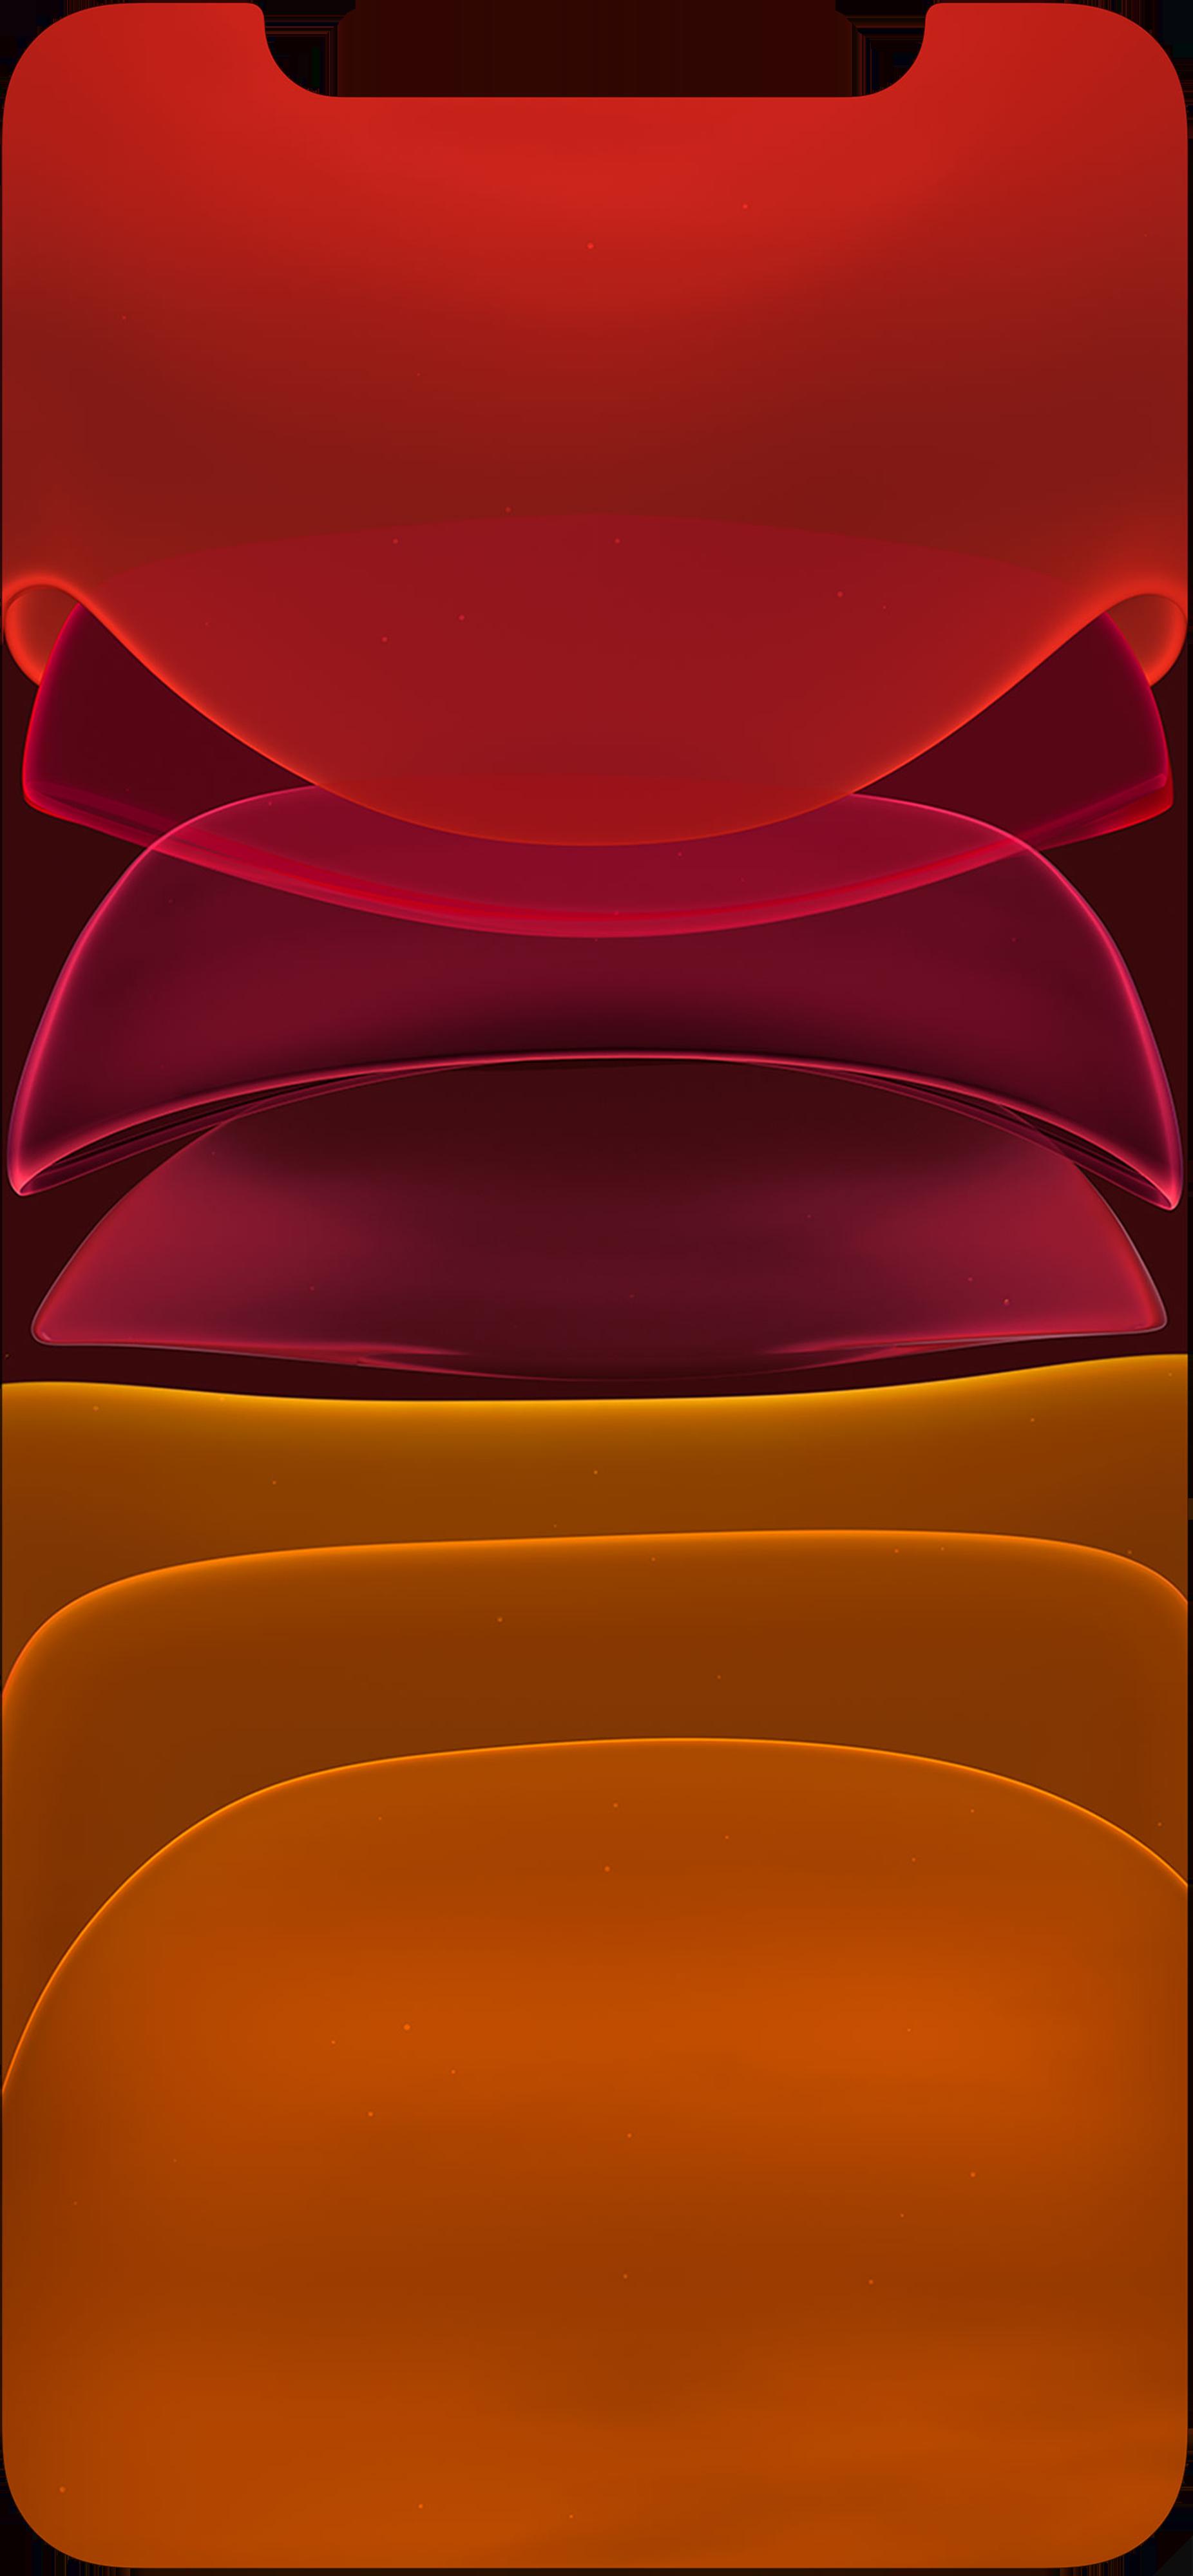 # Iphone11 # IOS13 # iphone11wallpaper #darkmode